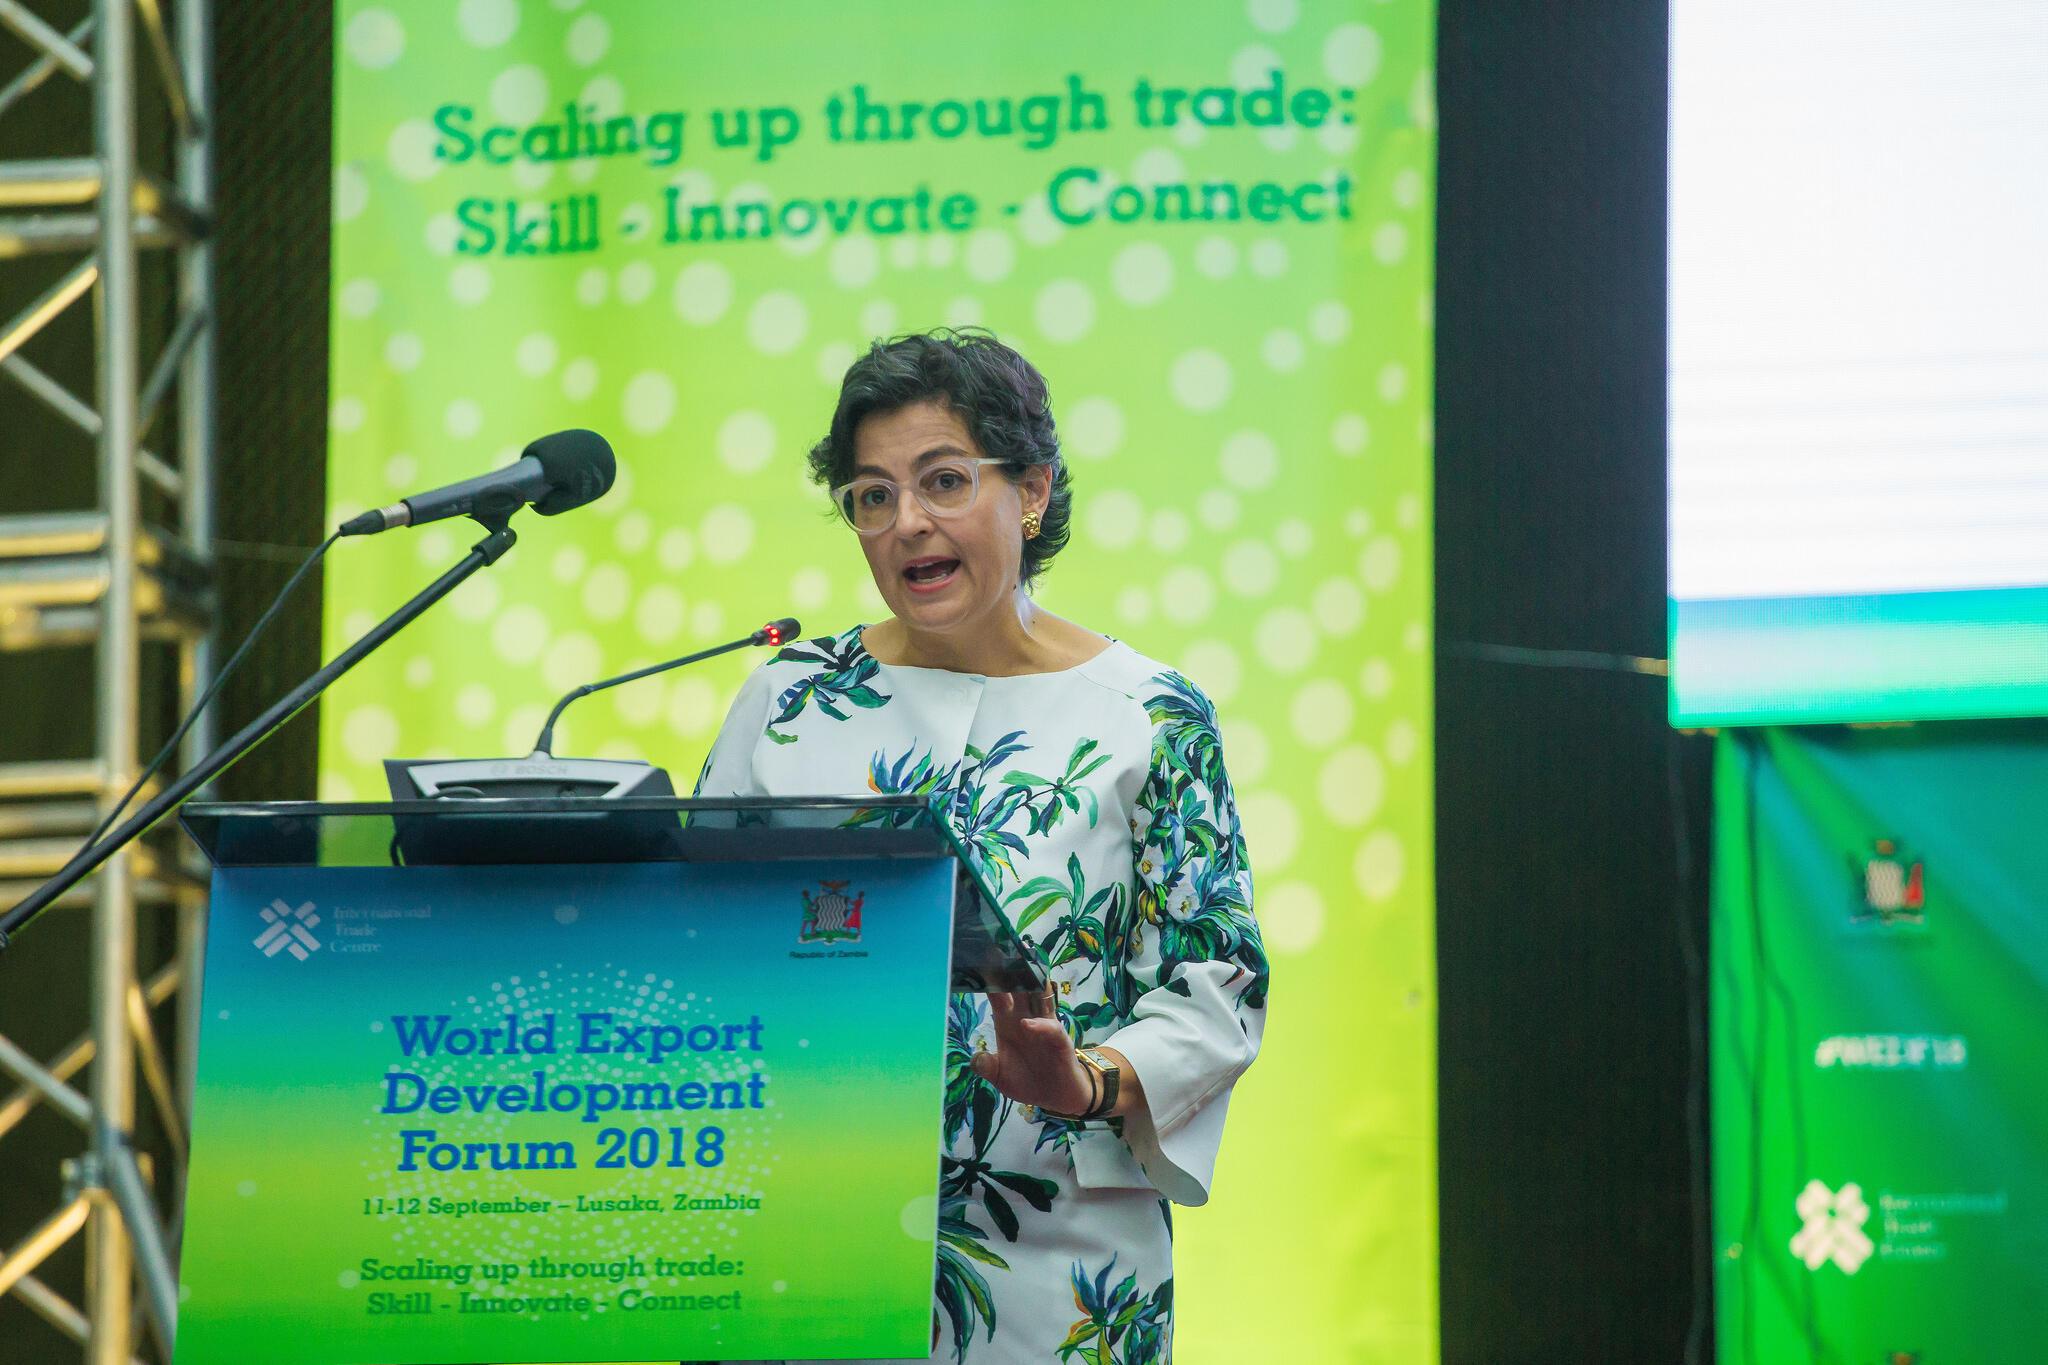 Arancha González at the opening of the World Export Development Forum in Lusaka, 9 September 2018.